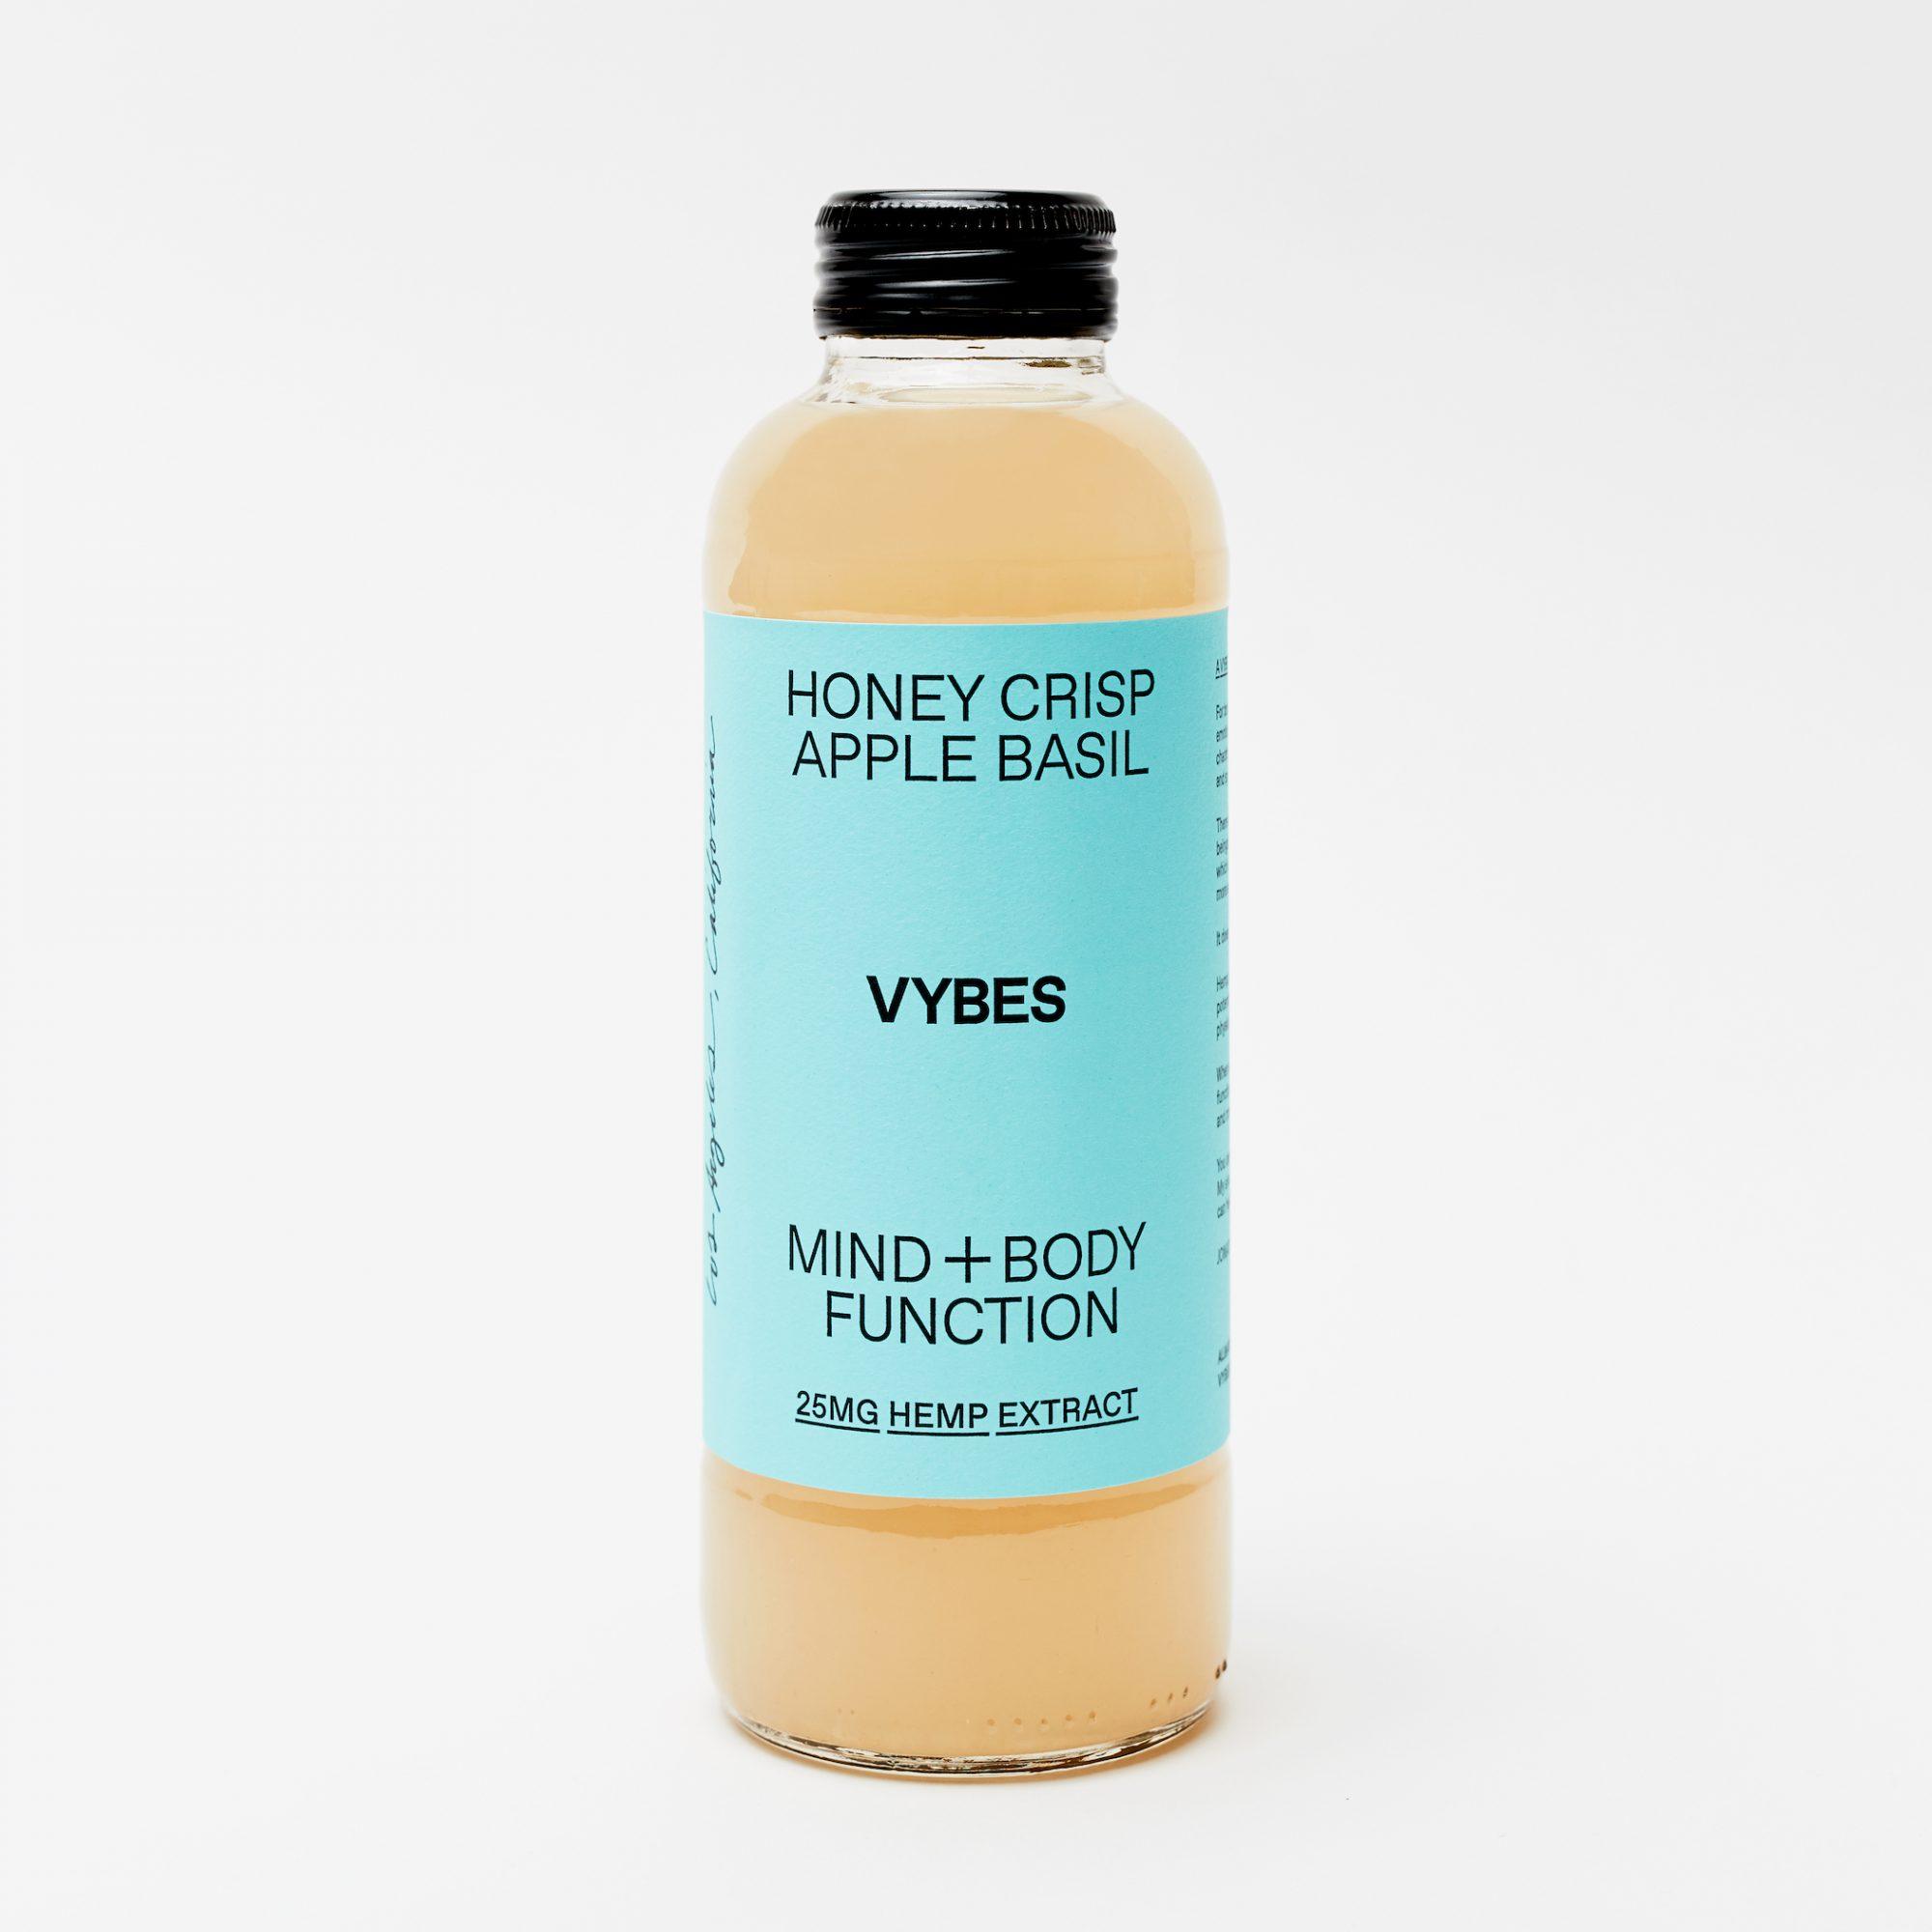 Honeycrisp Apple Basil VYBES - Honeycrisp Apple Basil (12 pk)